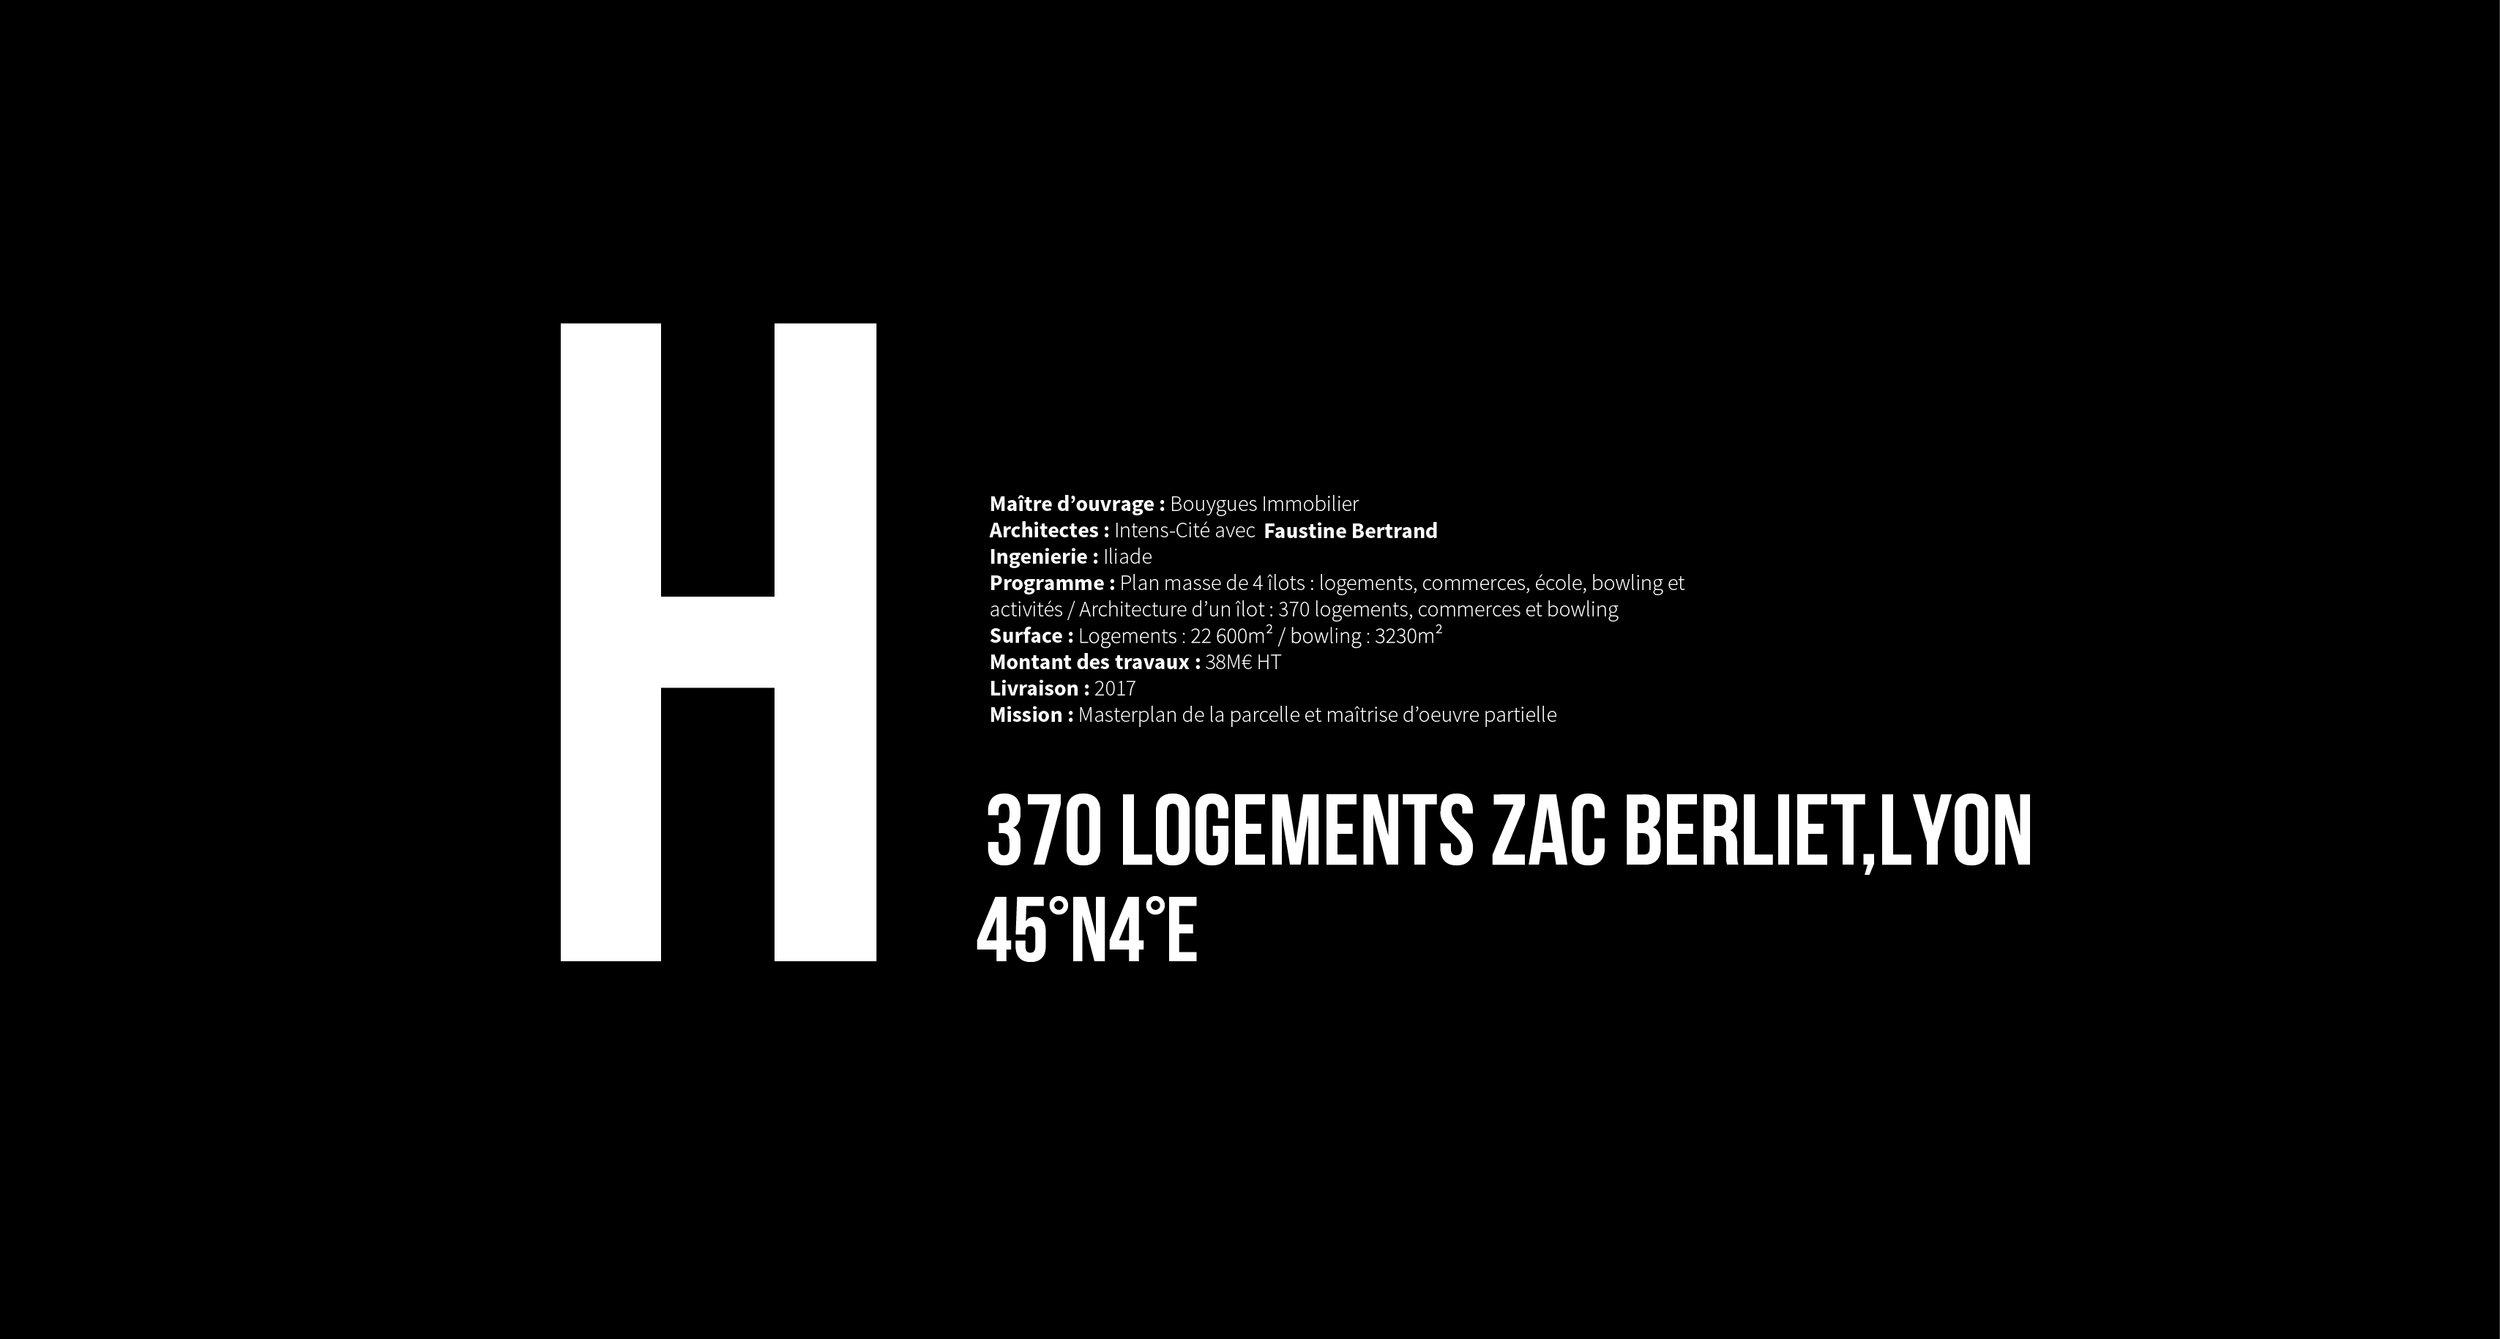 berliet01_l-01_black-02-01-01-01.jpg